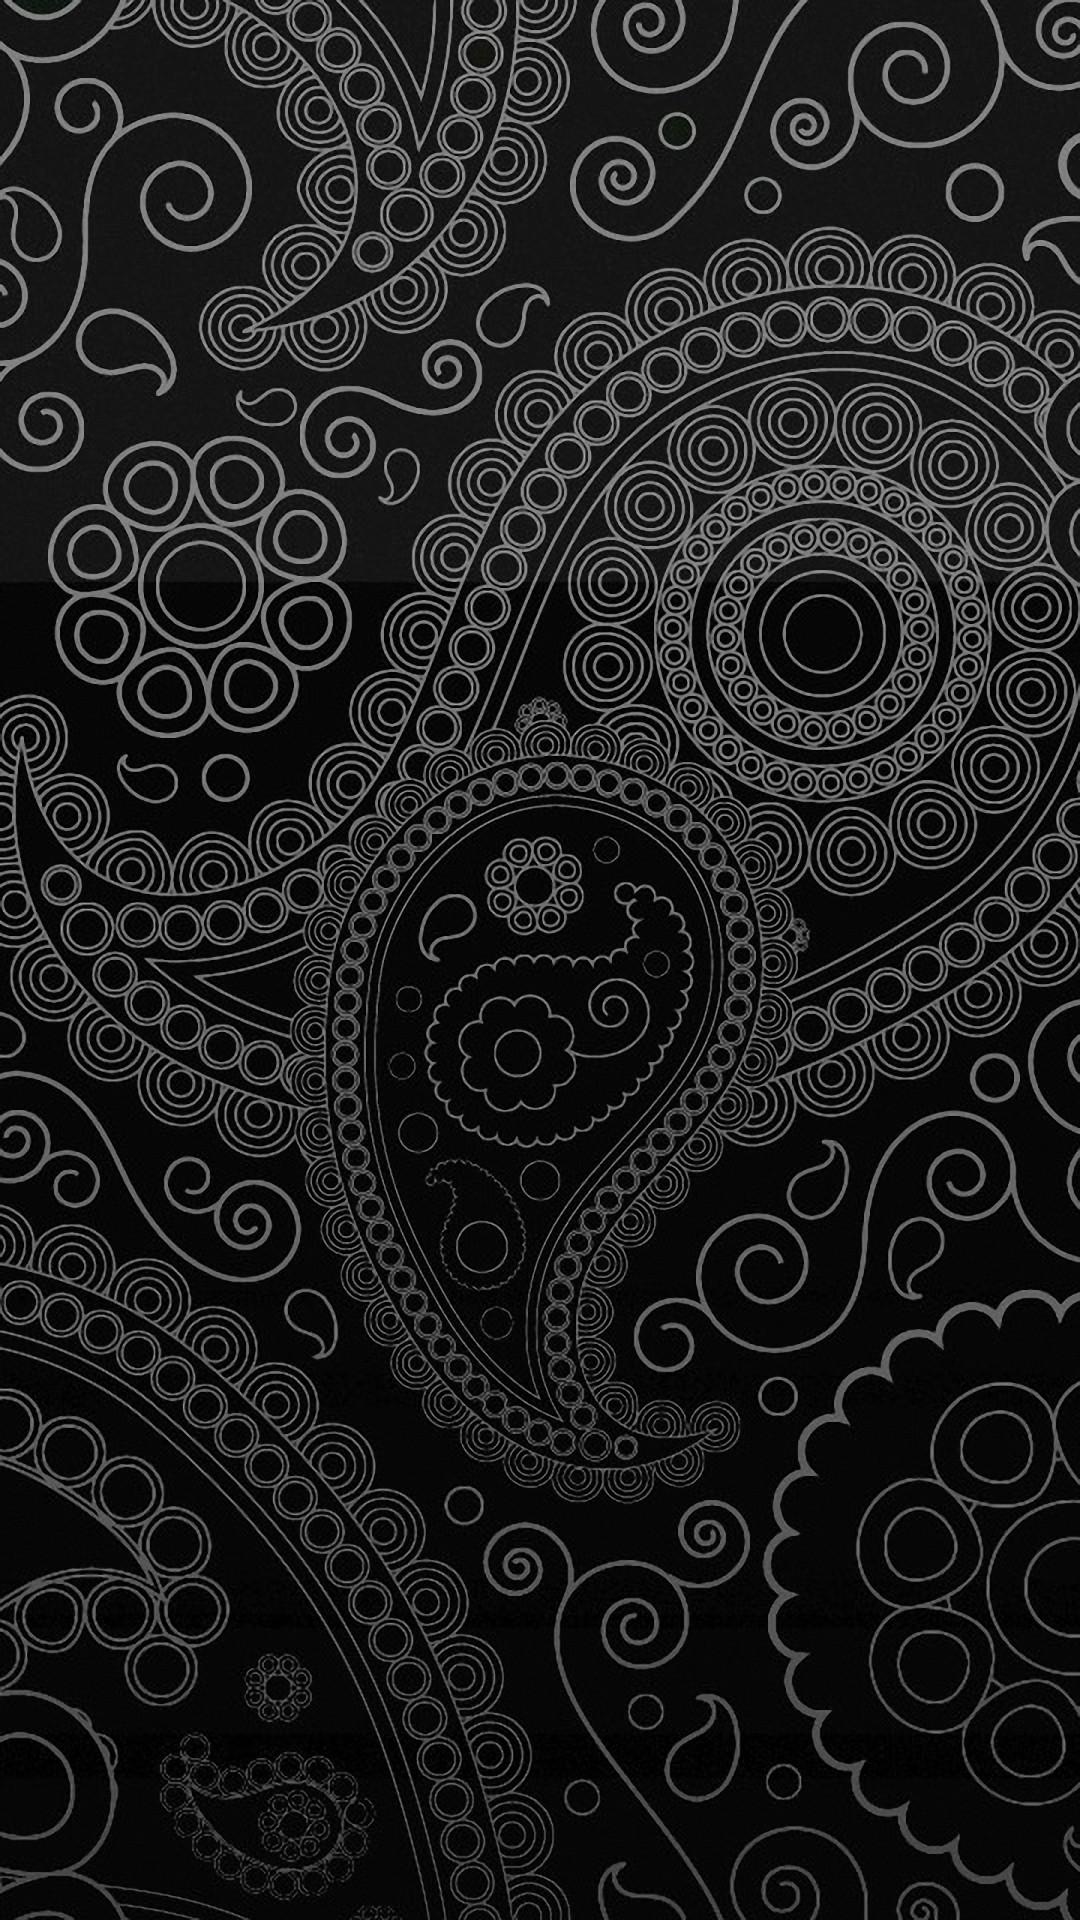 Pattern iphone 6 wallpaper